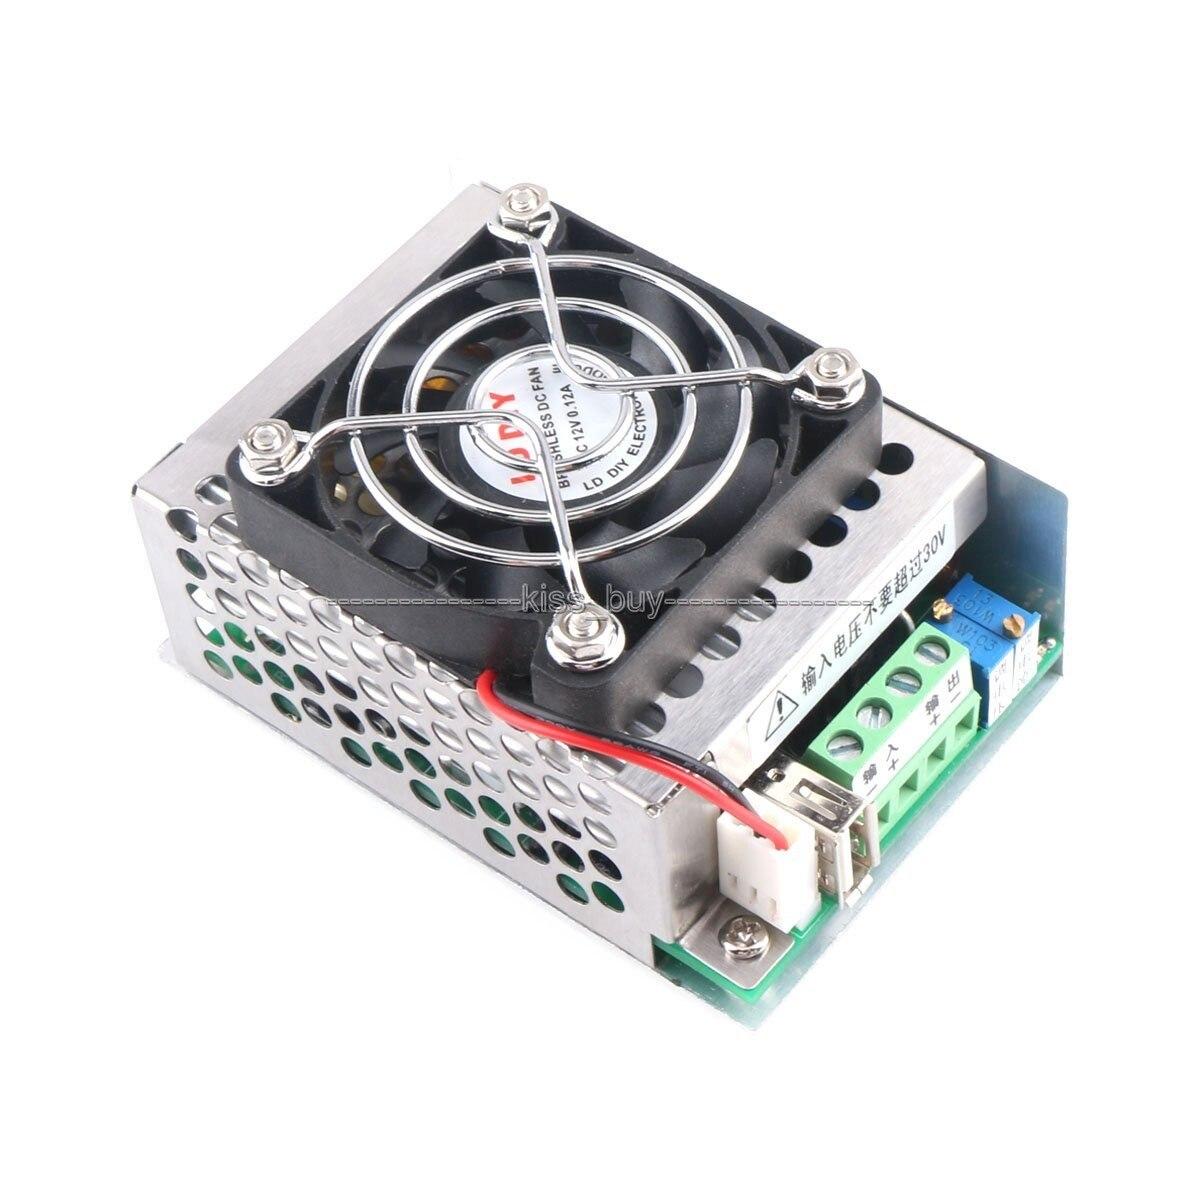 Convertidor Buck de 200W DC 8V ~ 40V a 1,25 V ~ 36V 10A regulador de voltaje de CC-CV ajustable cargador USB para teléfono/tablet PC/laptop etc.